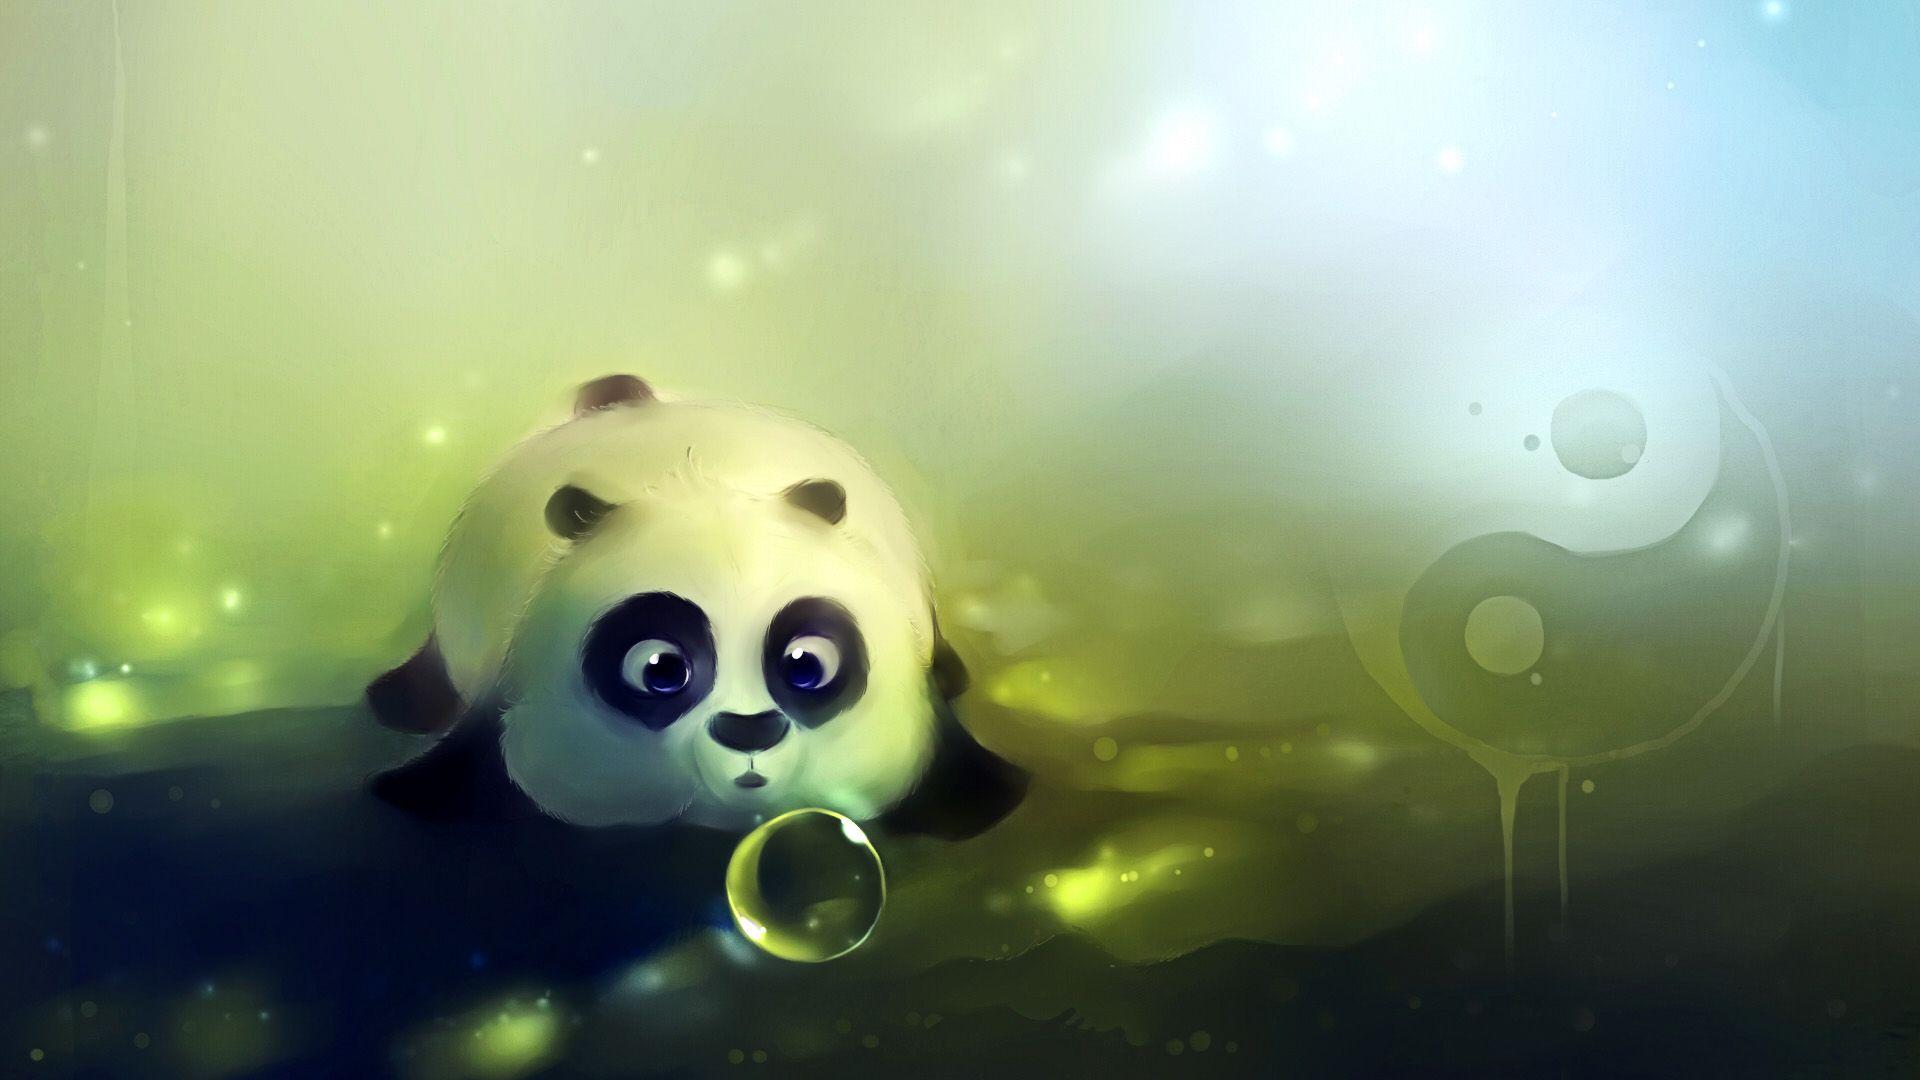 anime pandas in color Cute animated baby panda Anime